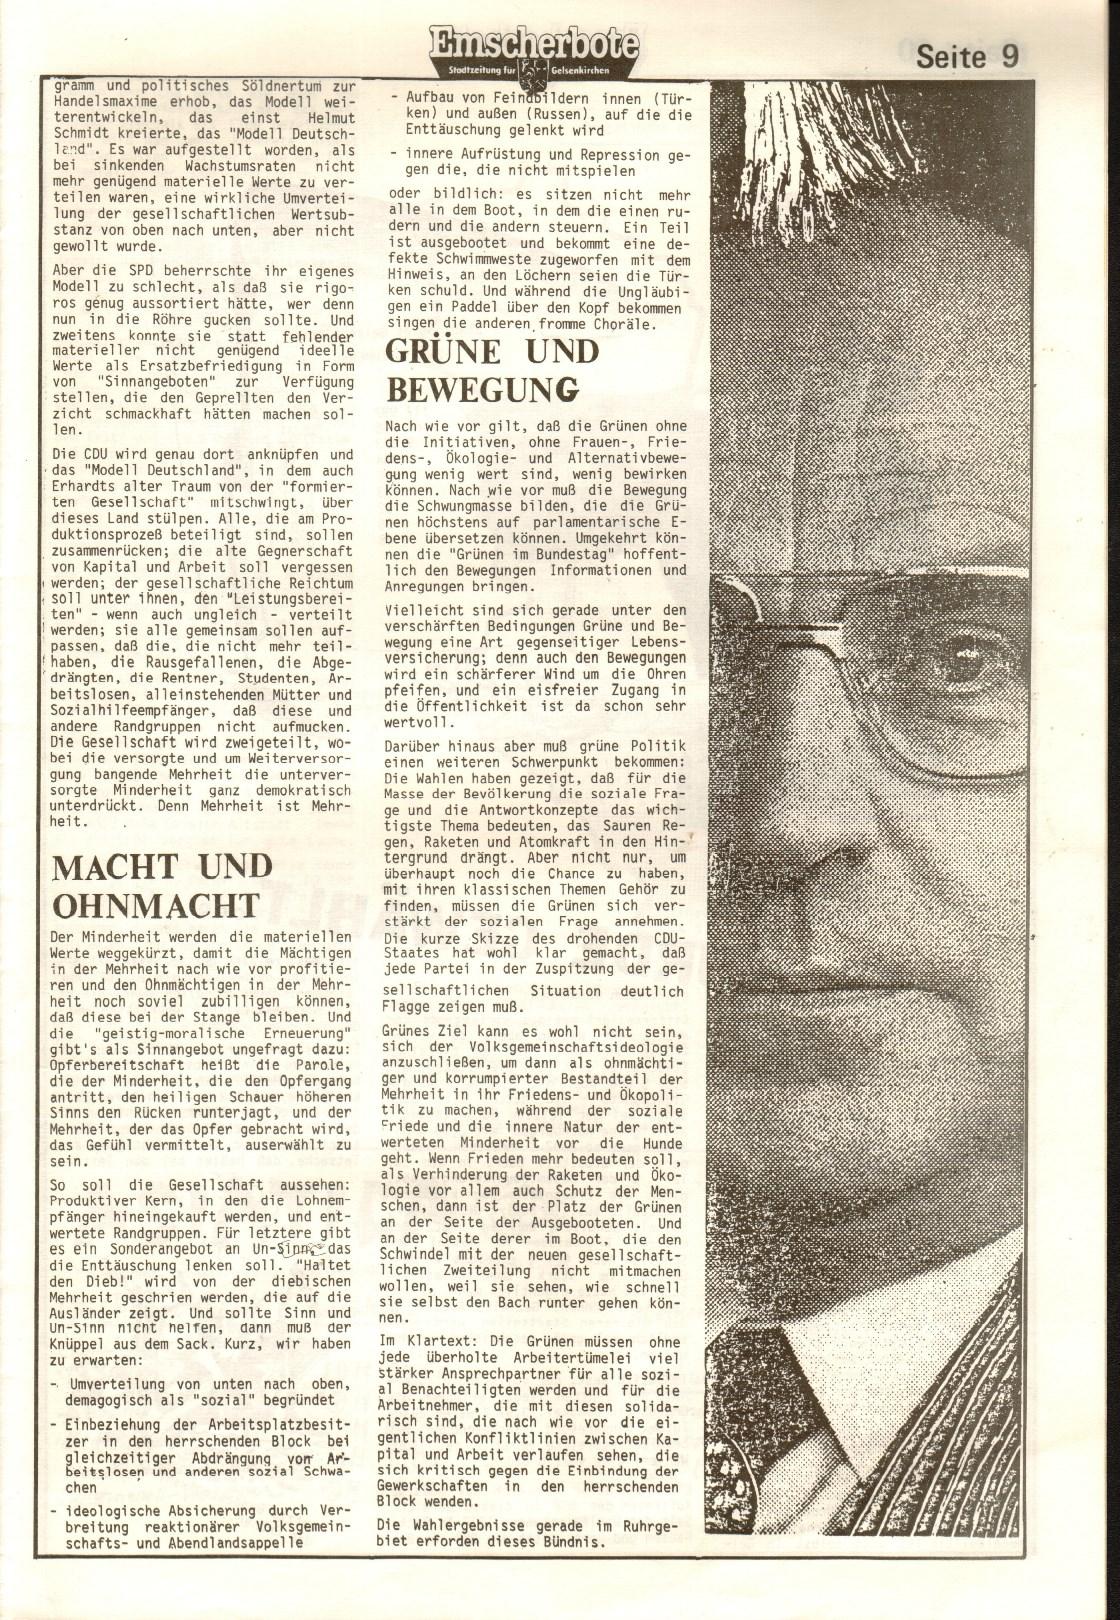 Gelsenkirchen_Emscherbote_1983_27_09